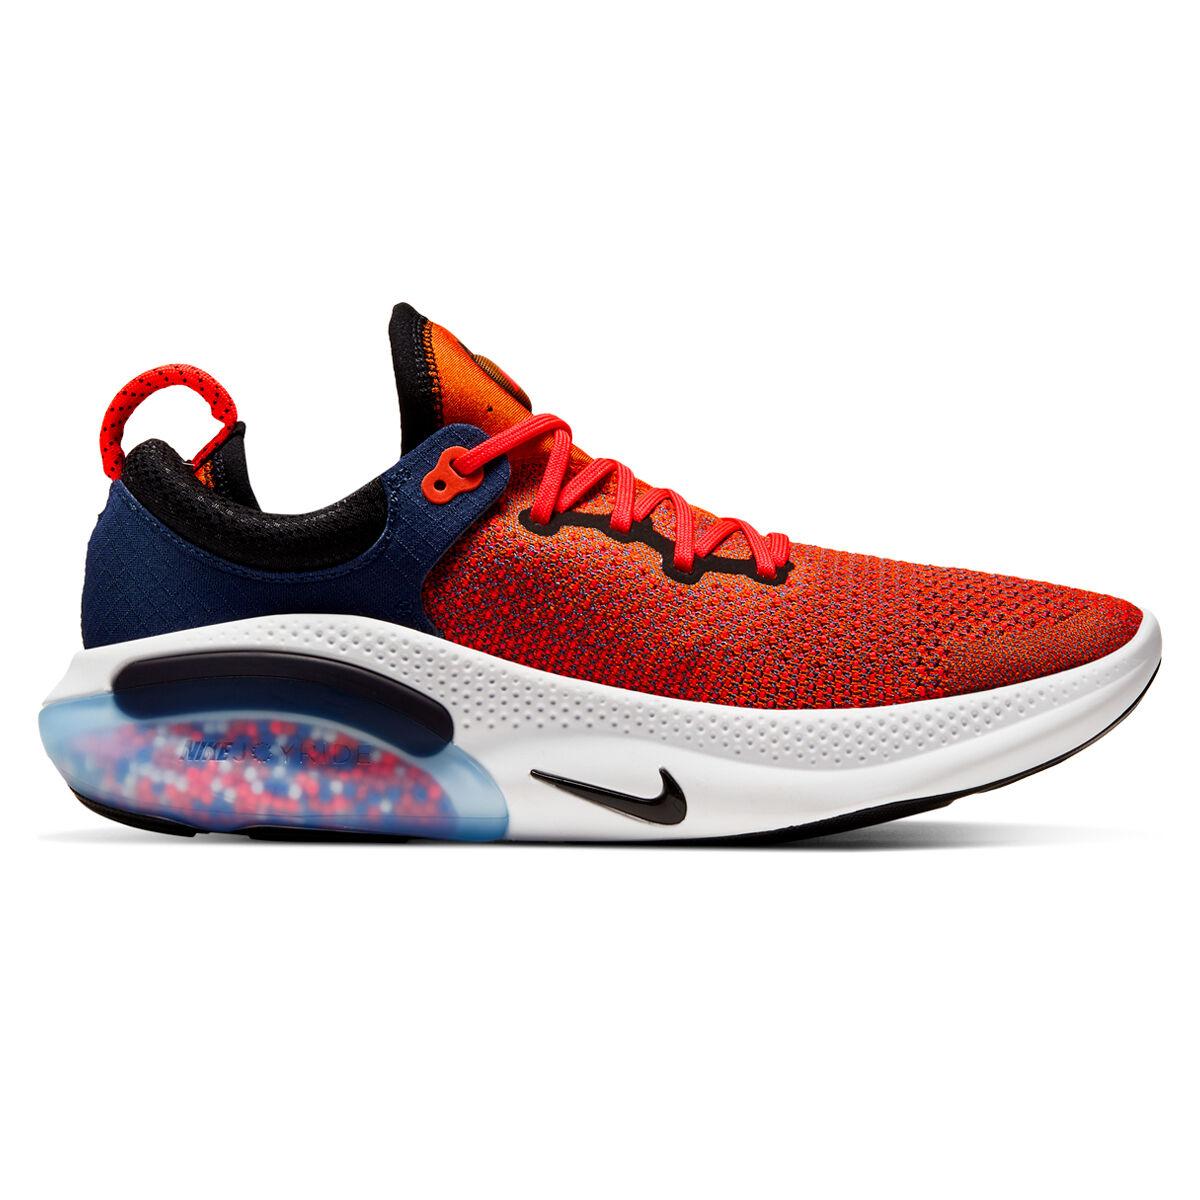 Nike Joyride Mens Running Shoes Orange